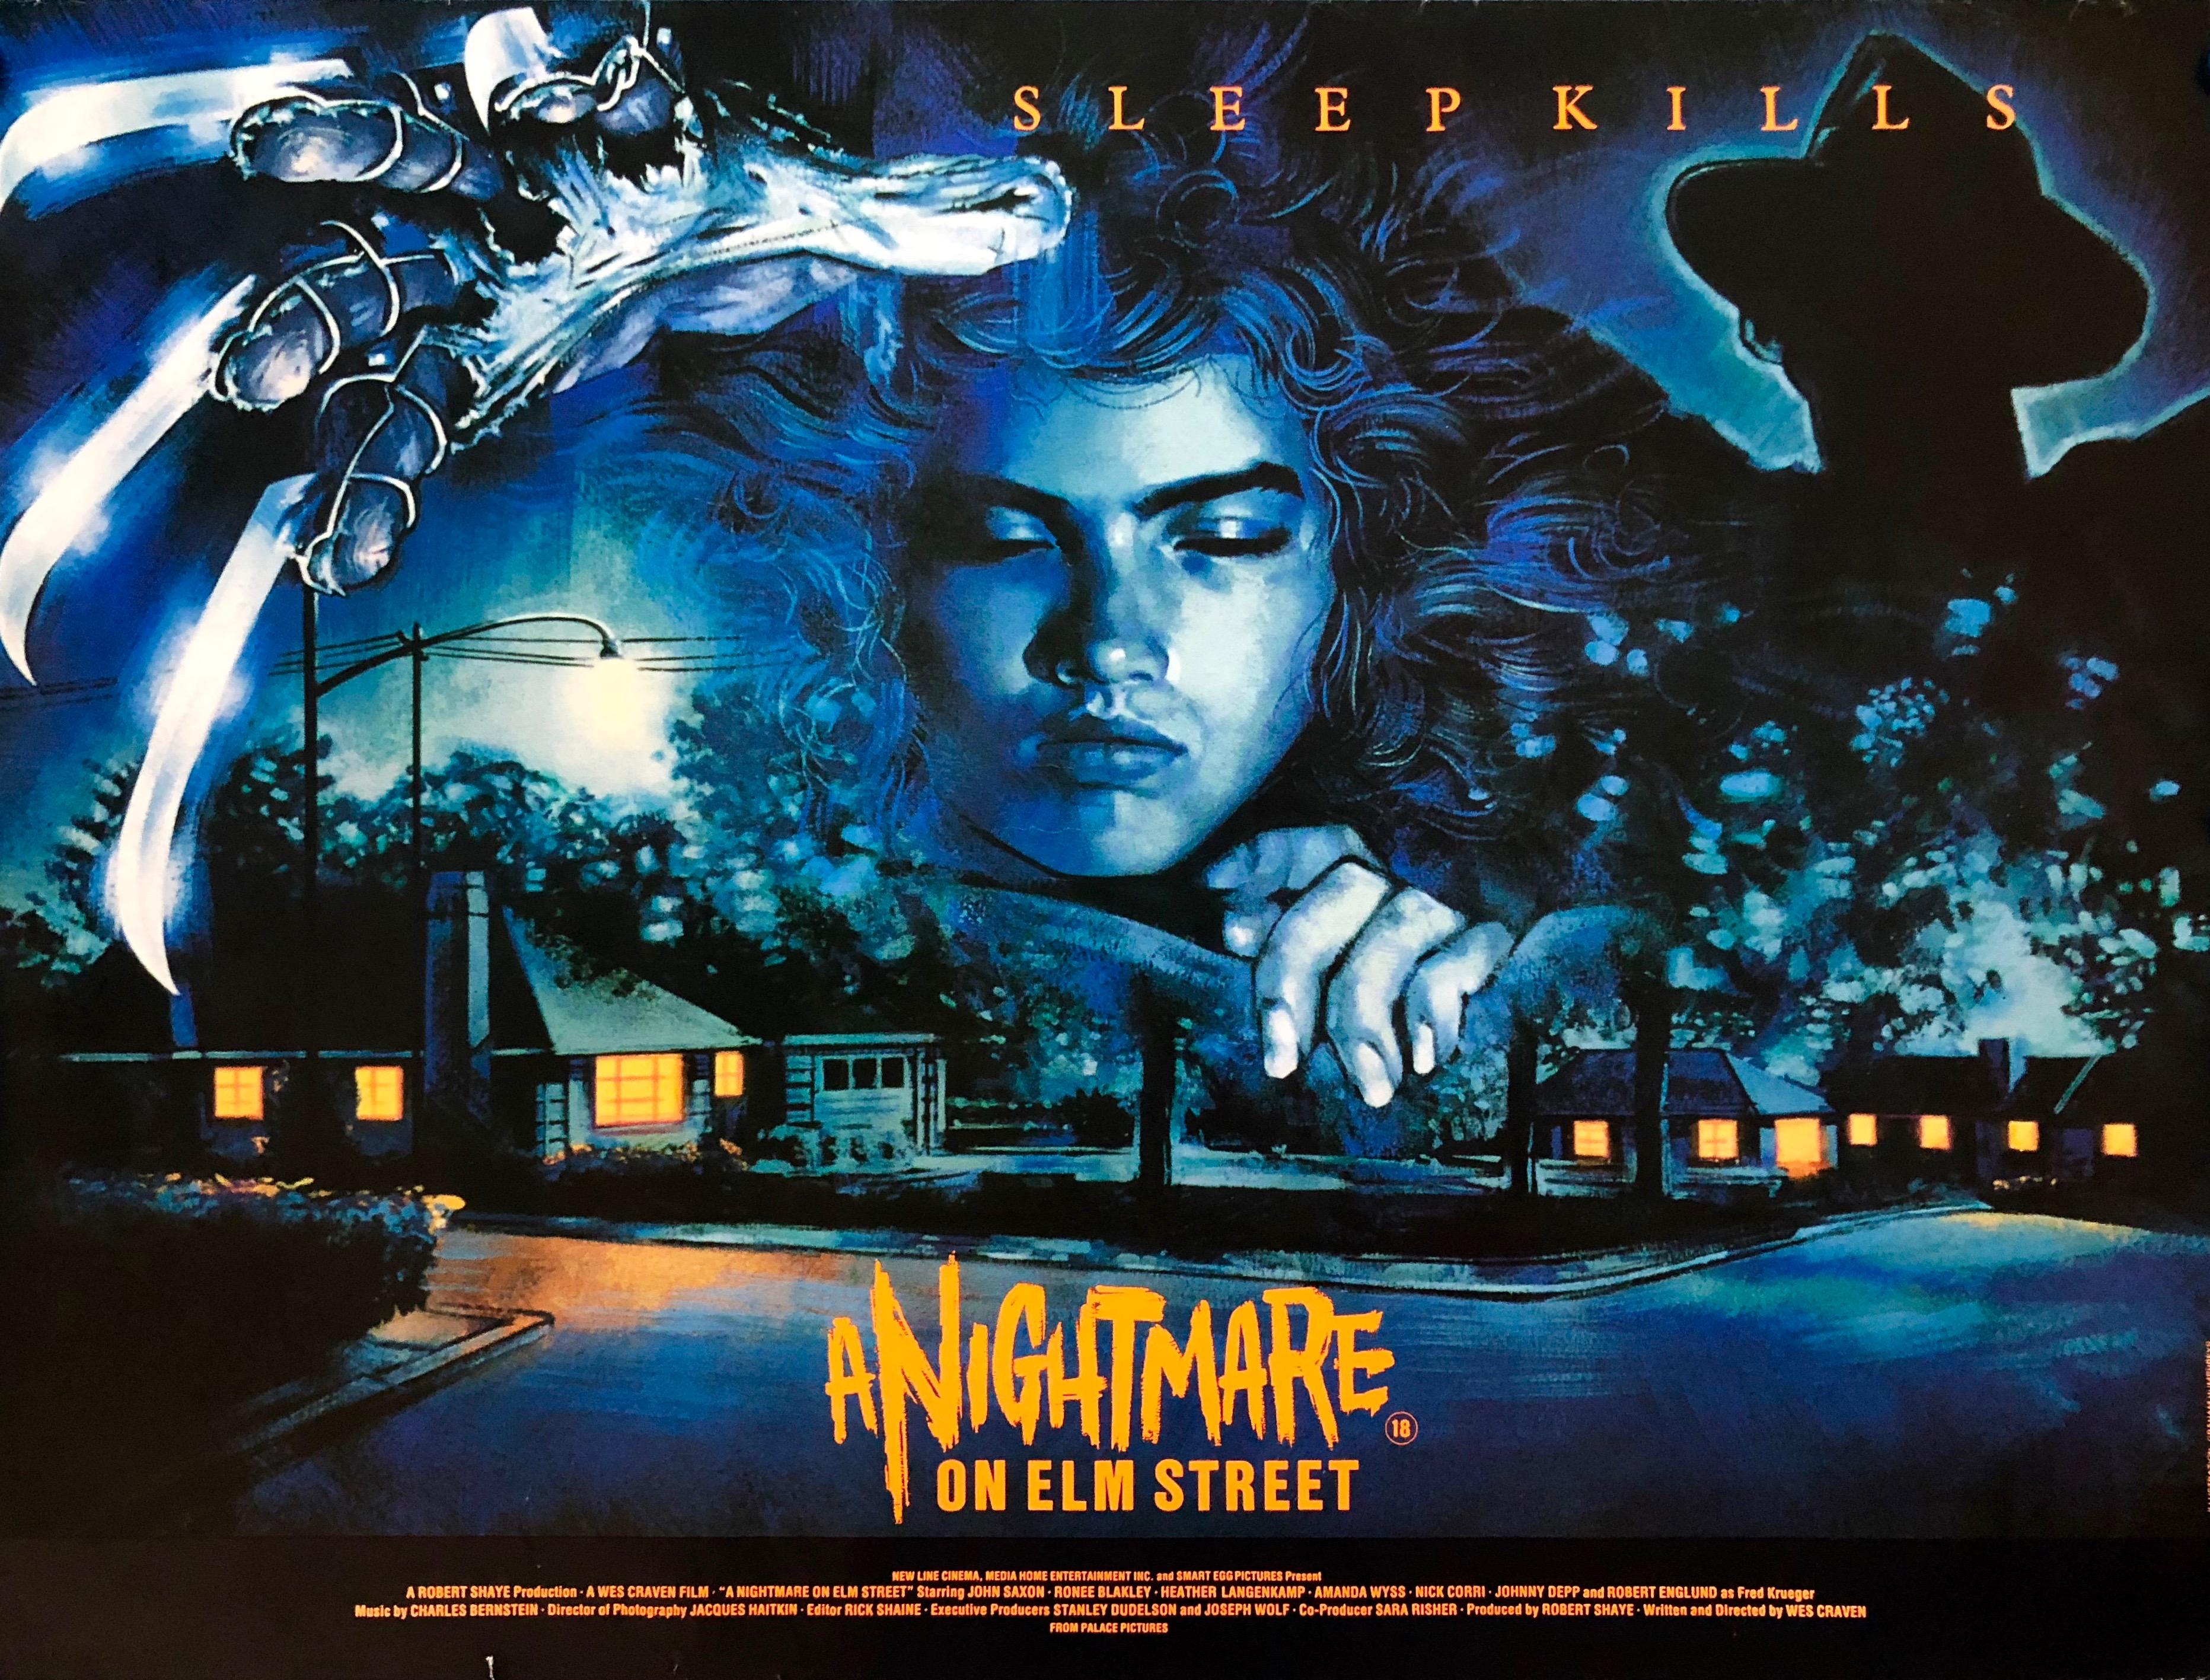 A-Nightmare-on-Elm-Street-Movie-Poster